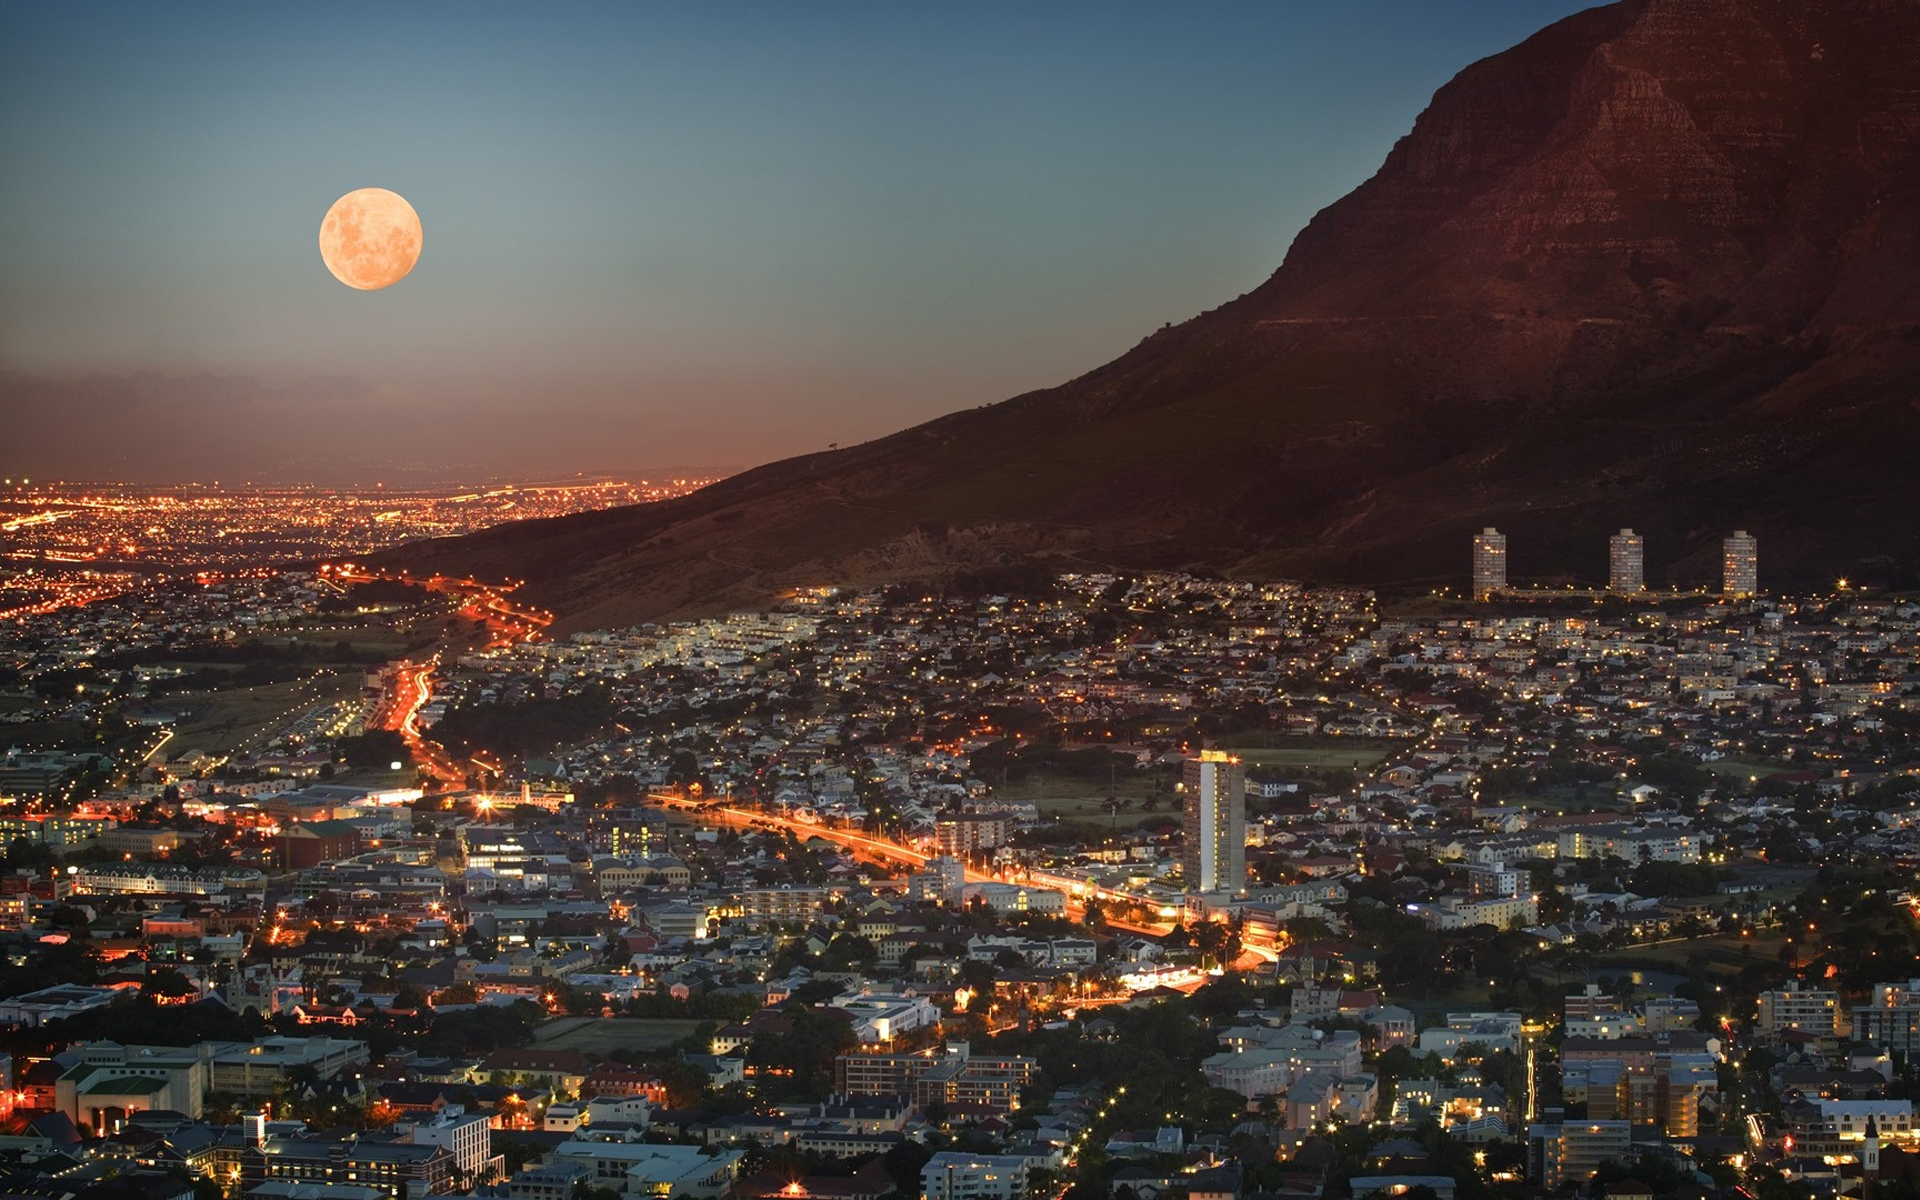 South Africa Cape Town Metropolis Wallpaper Hd City 4k